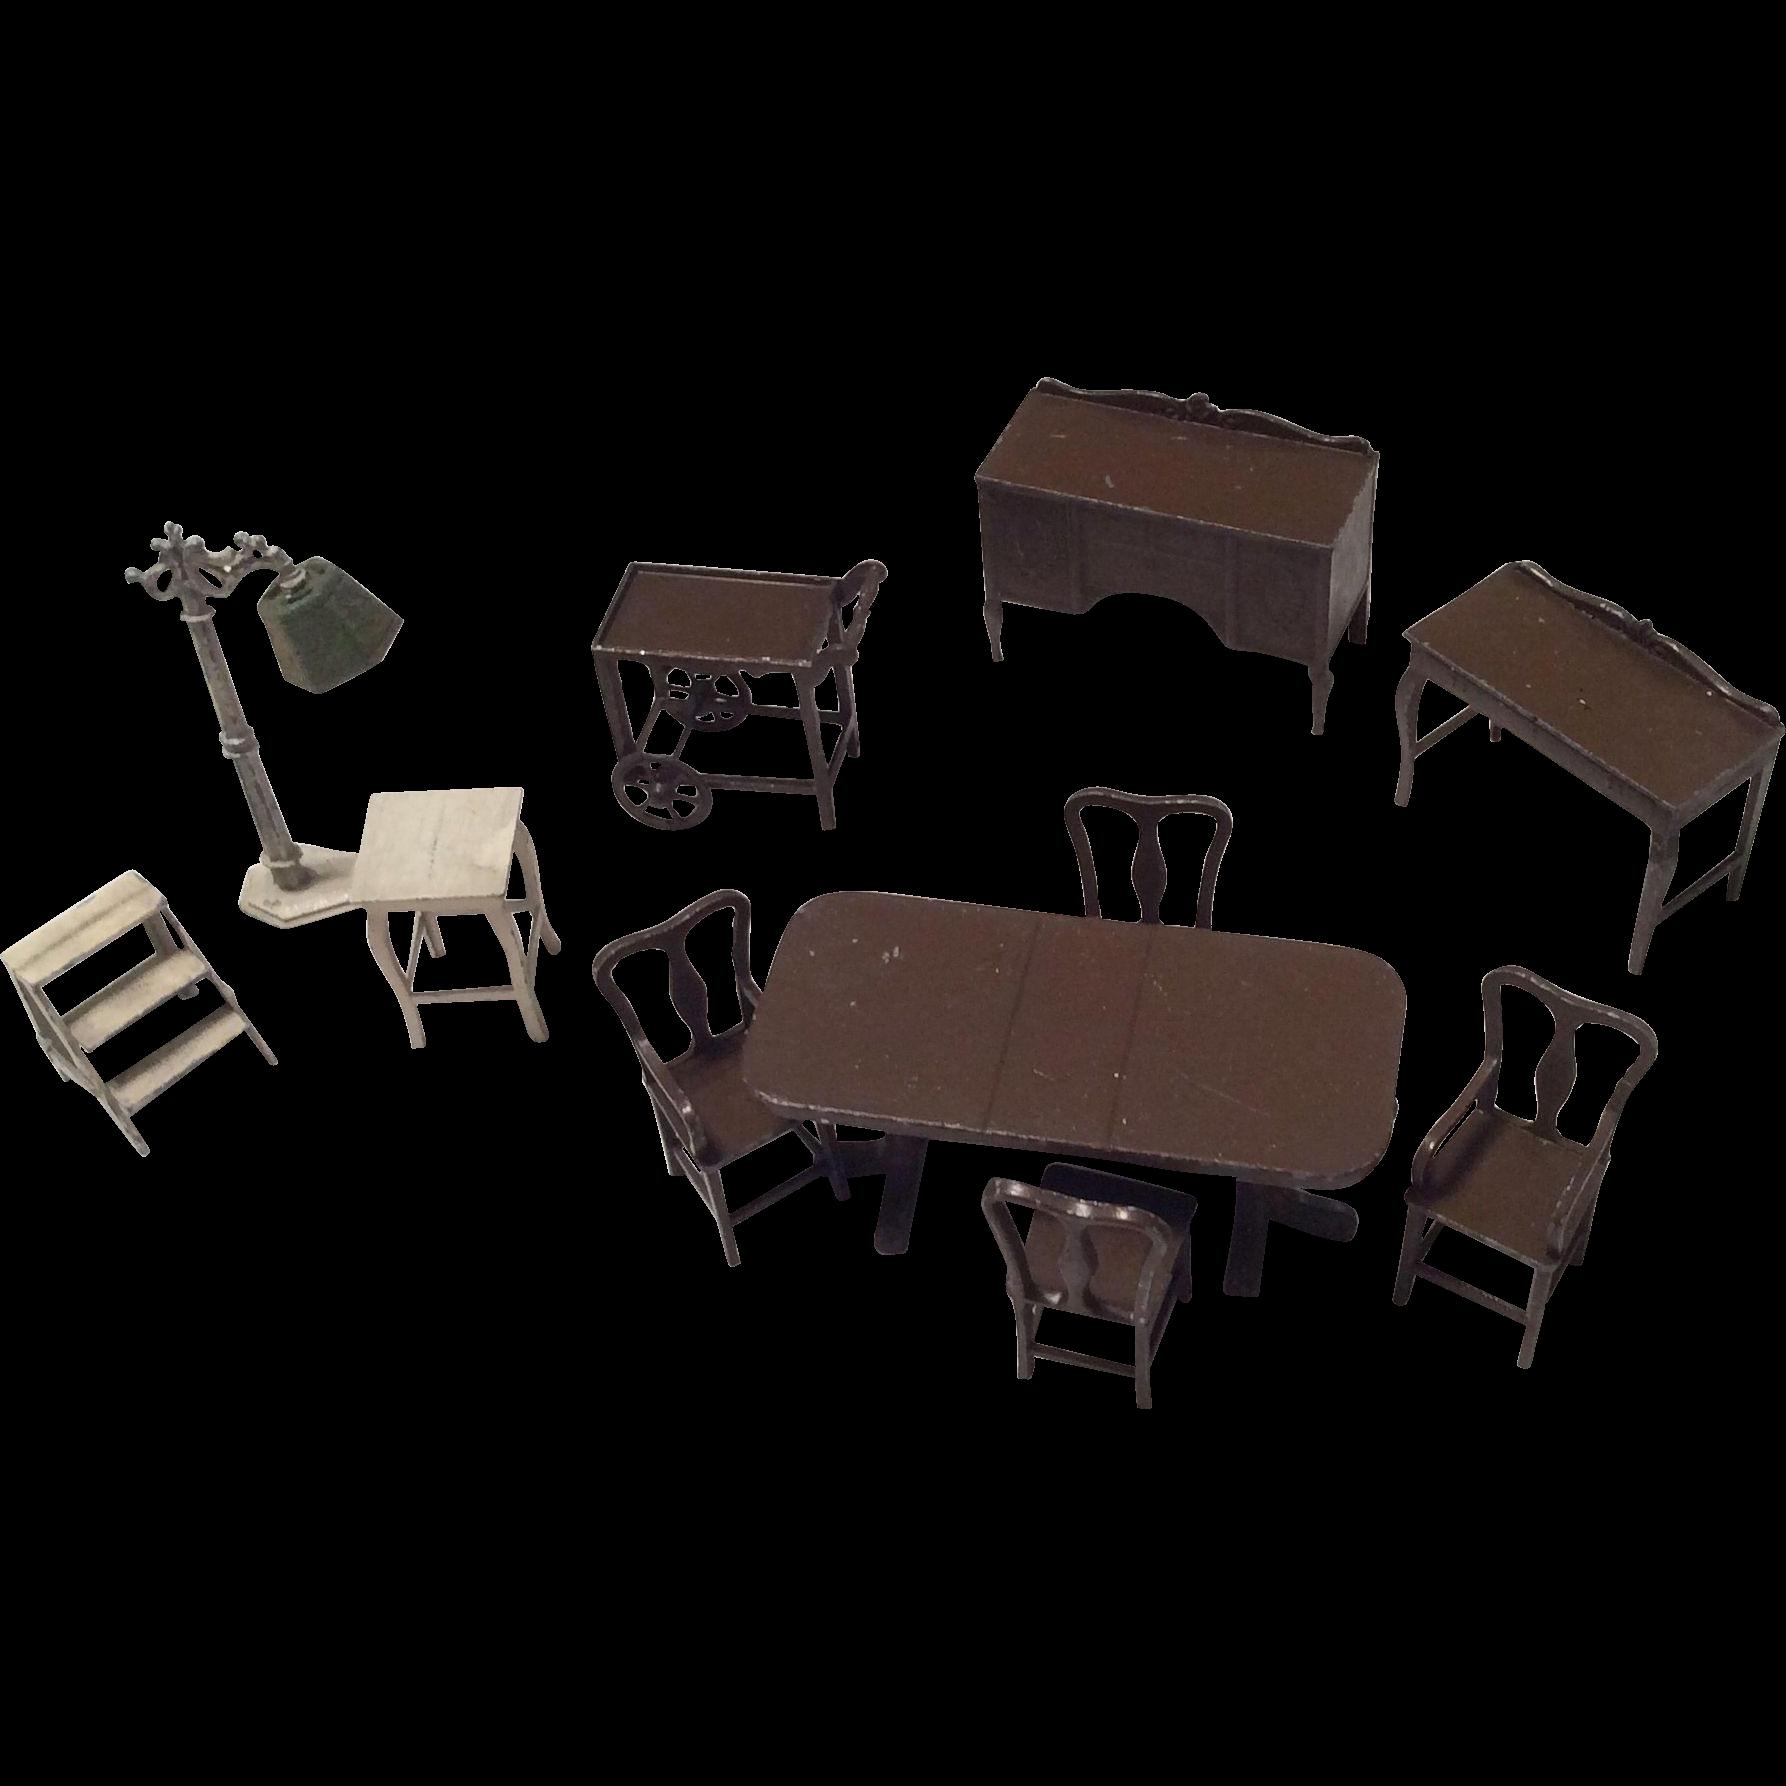 11 pc miniature dollhouse doll metal furniture dining room kitchen